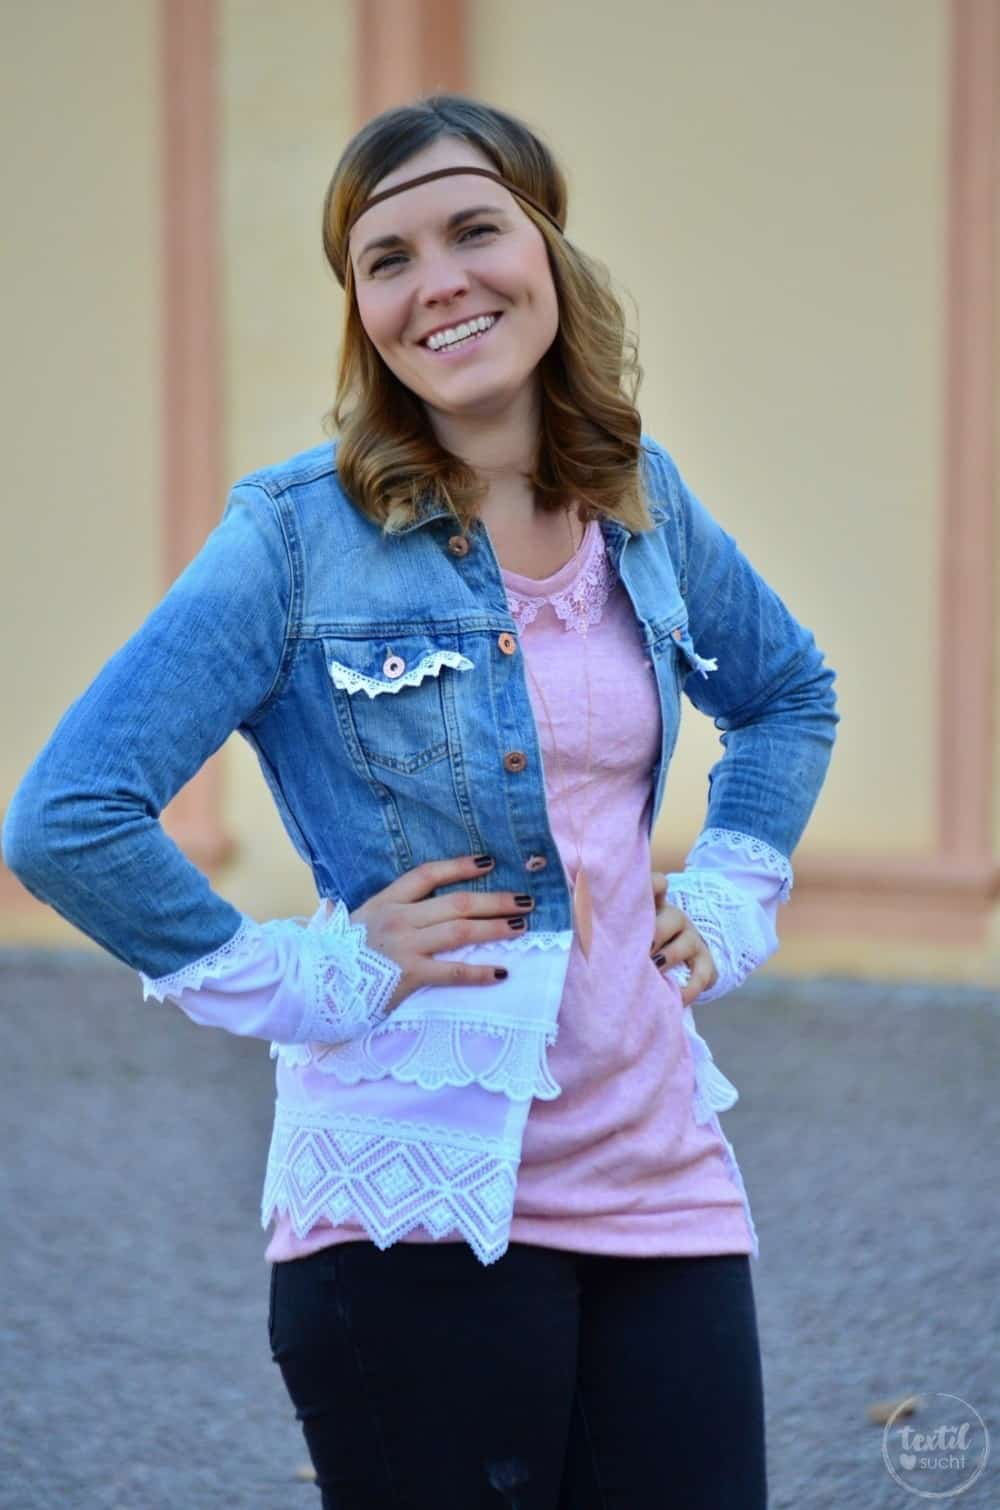 Tutorial: Jeansjacke Upcycling - Die fertige Jacke - Bild 1 | textilsucht.de